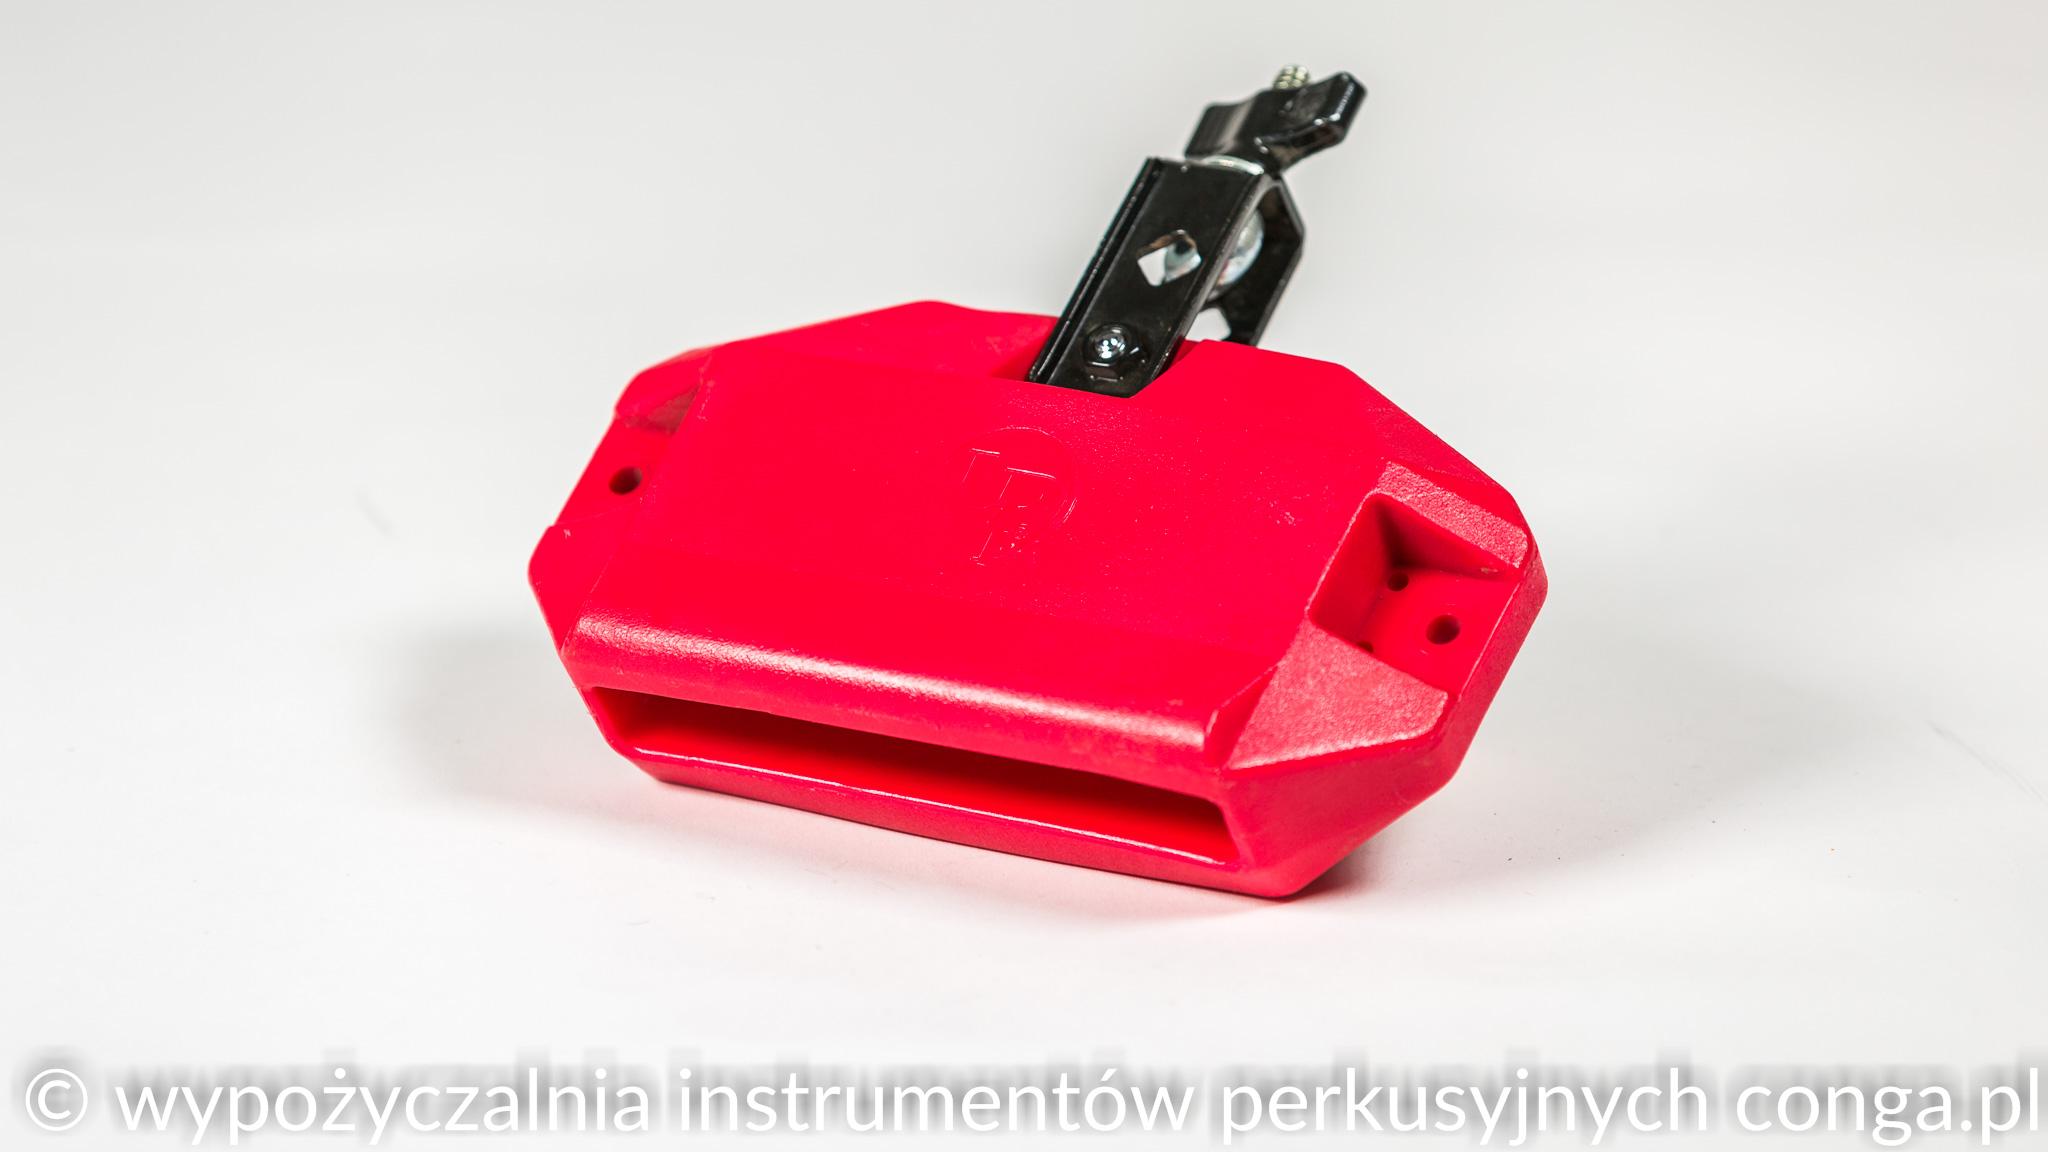 LP1207-JAM-BLOCK-MEDIUM--Wypożyczalnia-instrumentów-perkusyjnych--CONGA.PL--0239.jpg